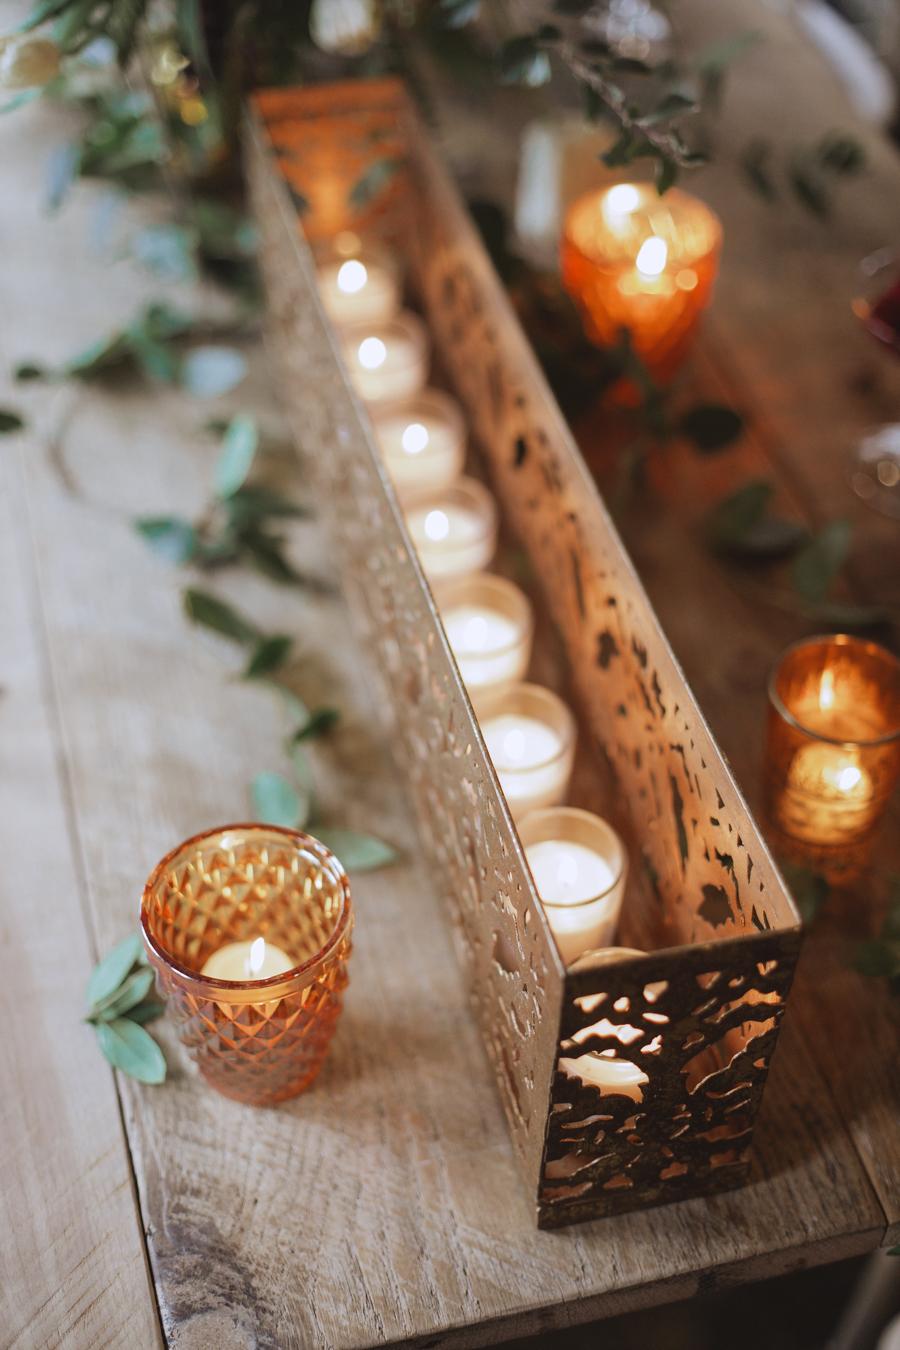 romantic lighting for weddings - https://ruffledblog.com/rustic-woodland-chic-wedding-inspiration-in-baltimore